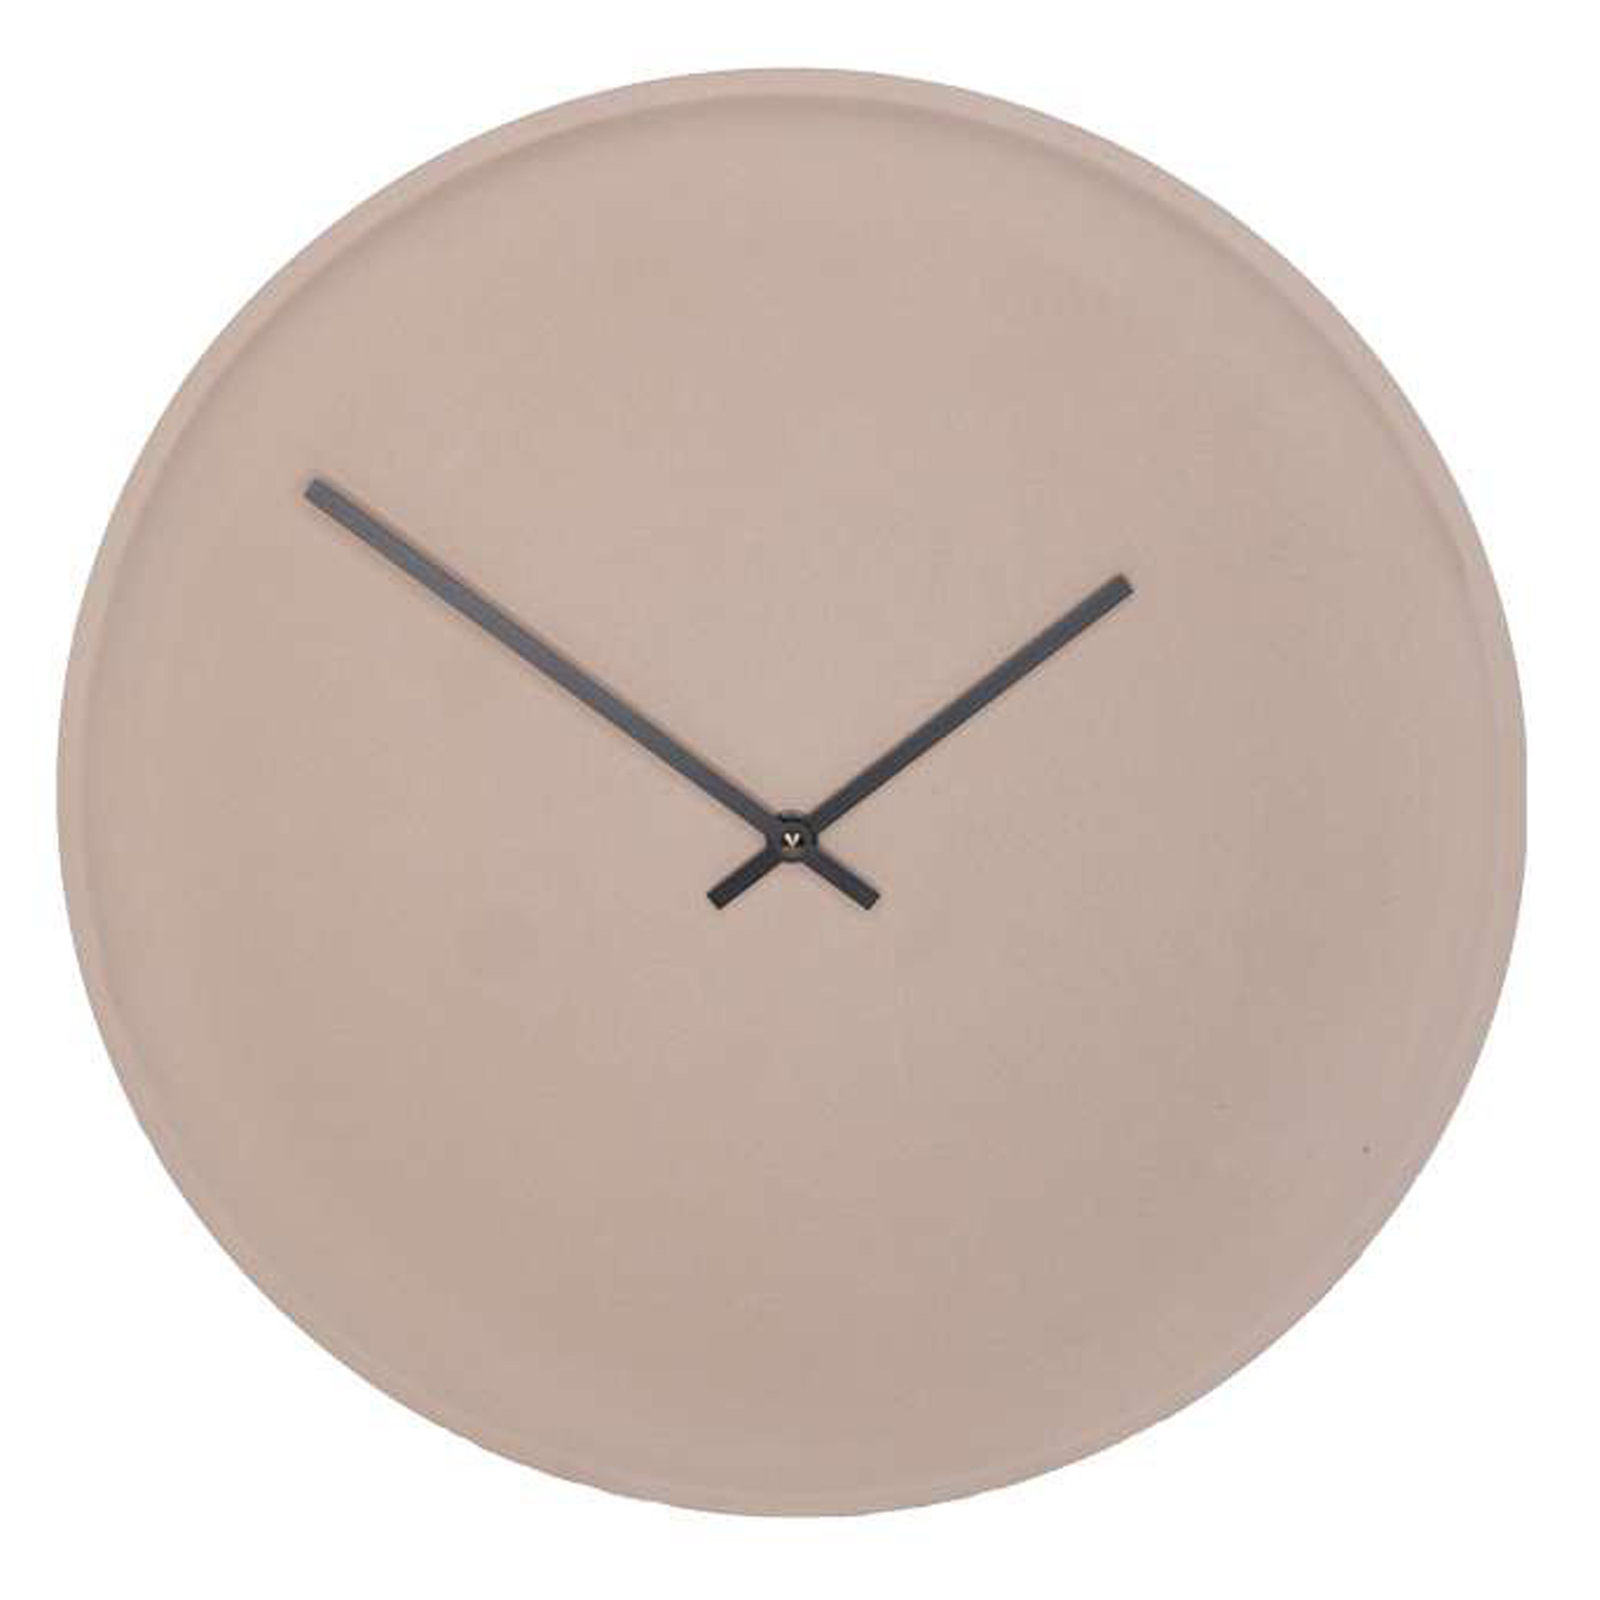 LIKEconcrete - Ida Wall Clock Ø 35 cm - Mocca (93789)